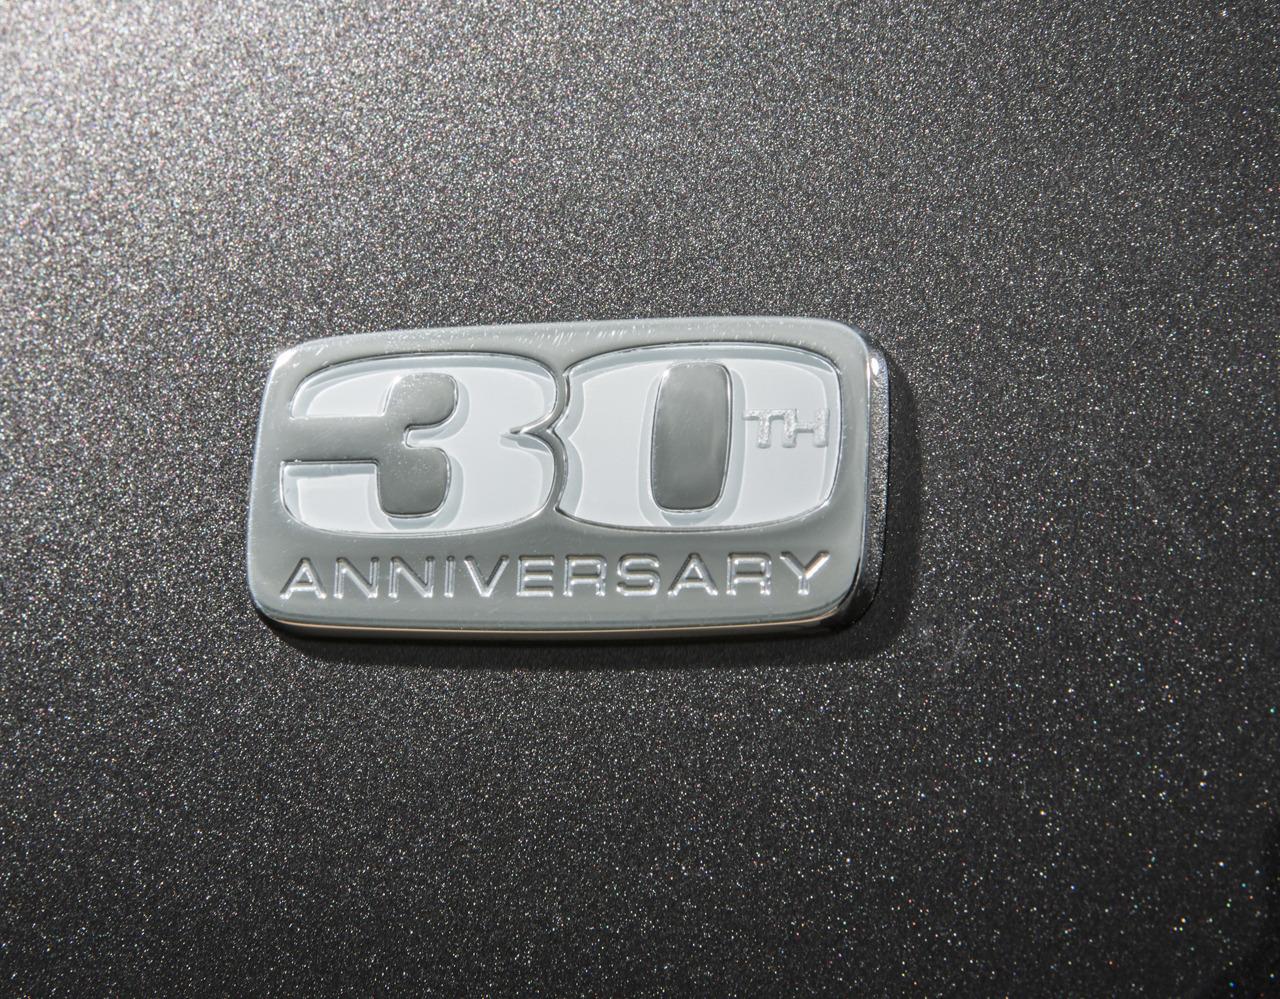 2014 Dodge Grand Caravan 30th Anniversary Edition Unveiled